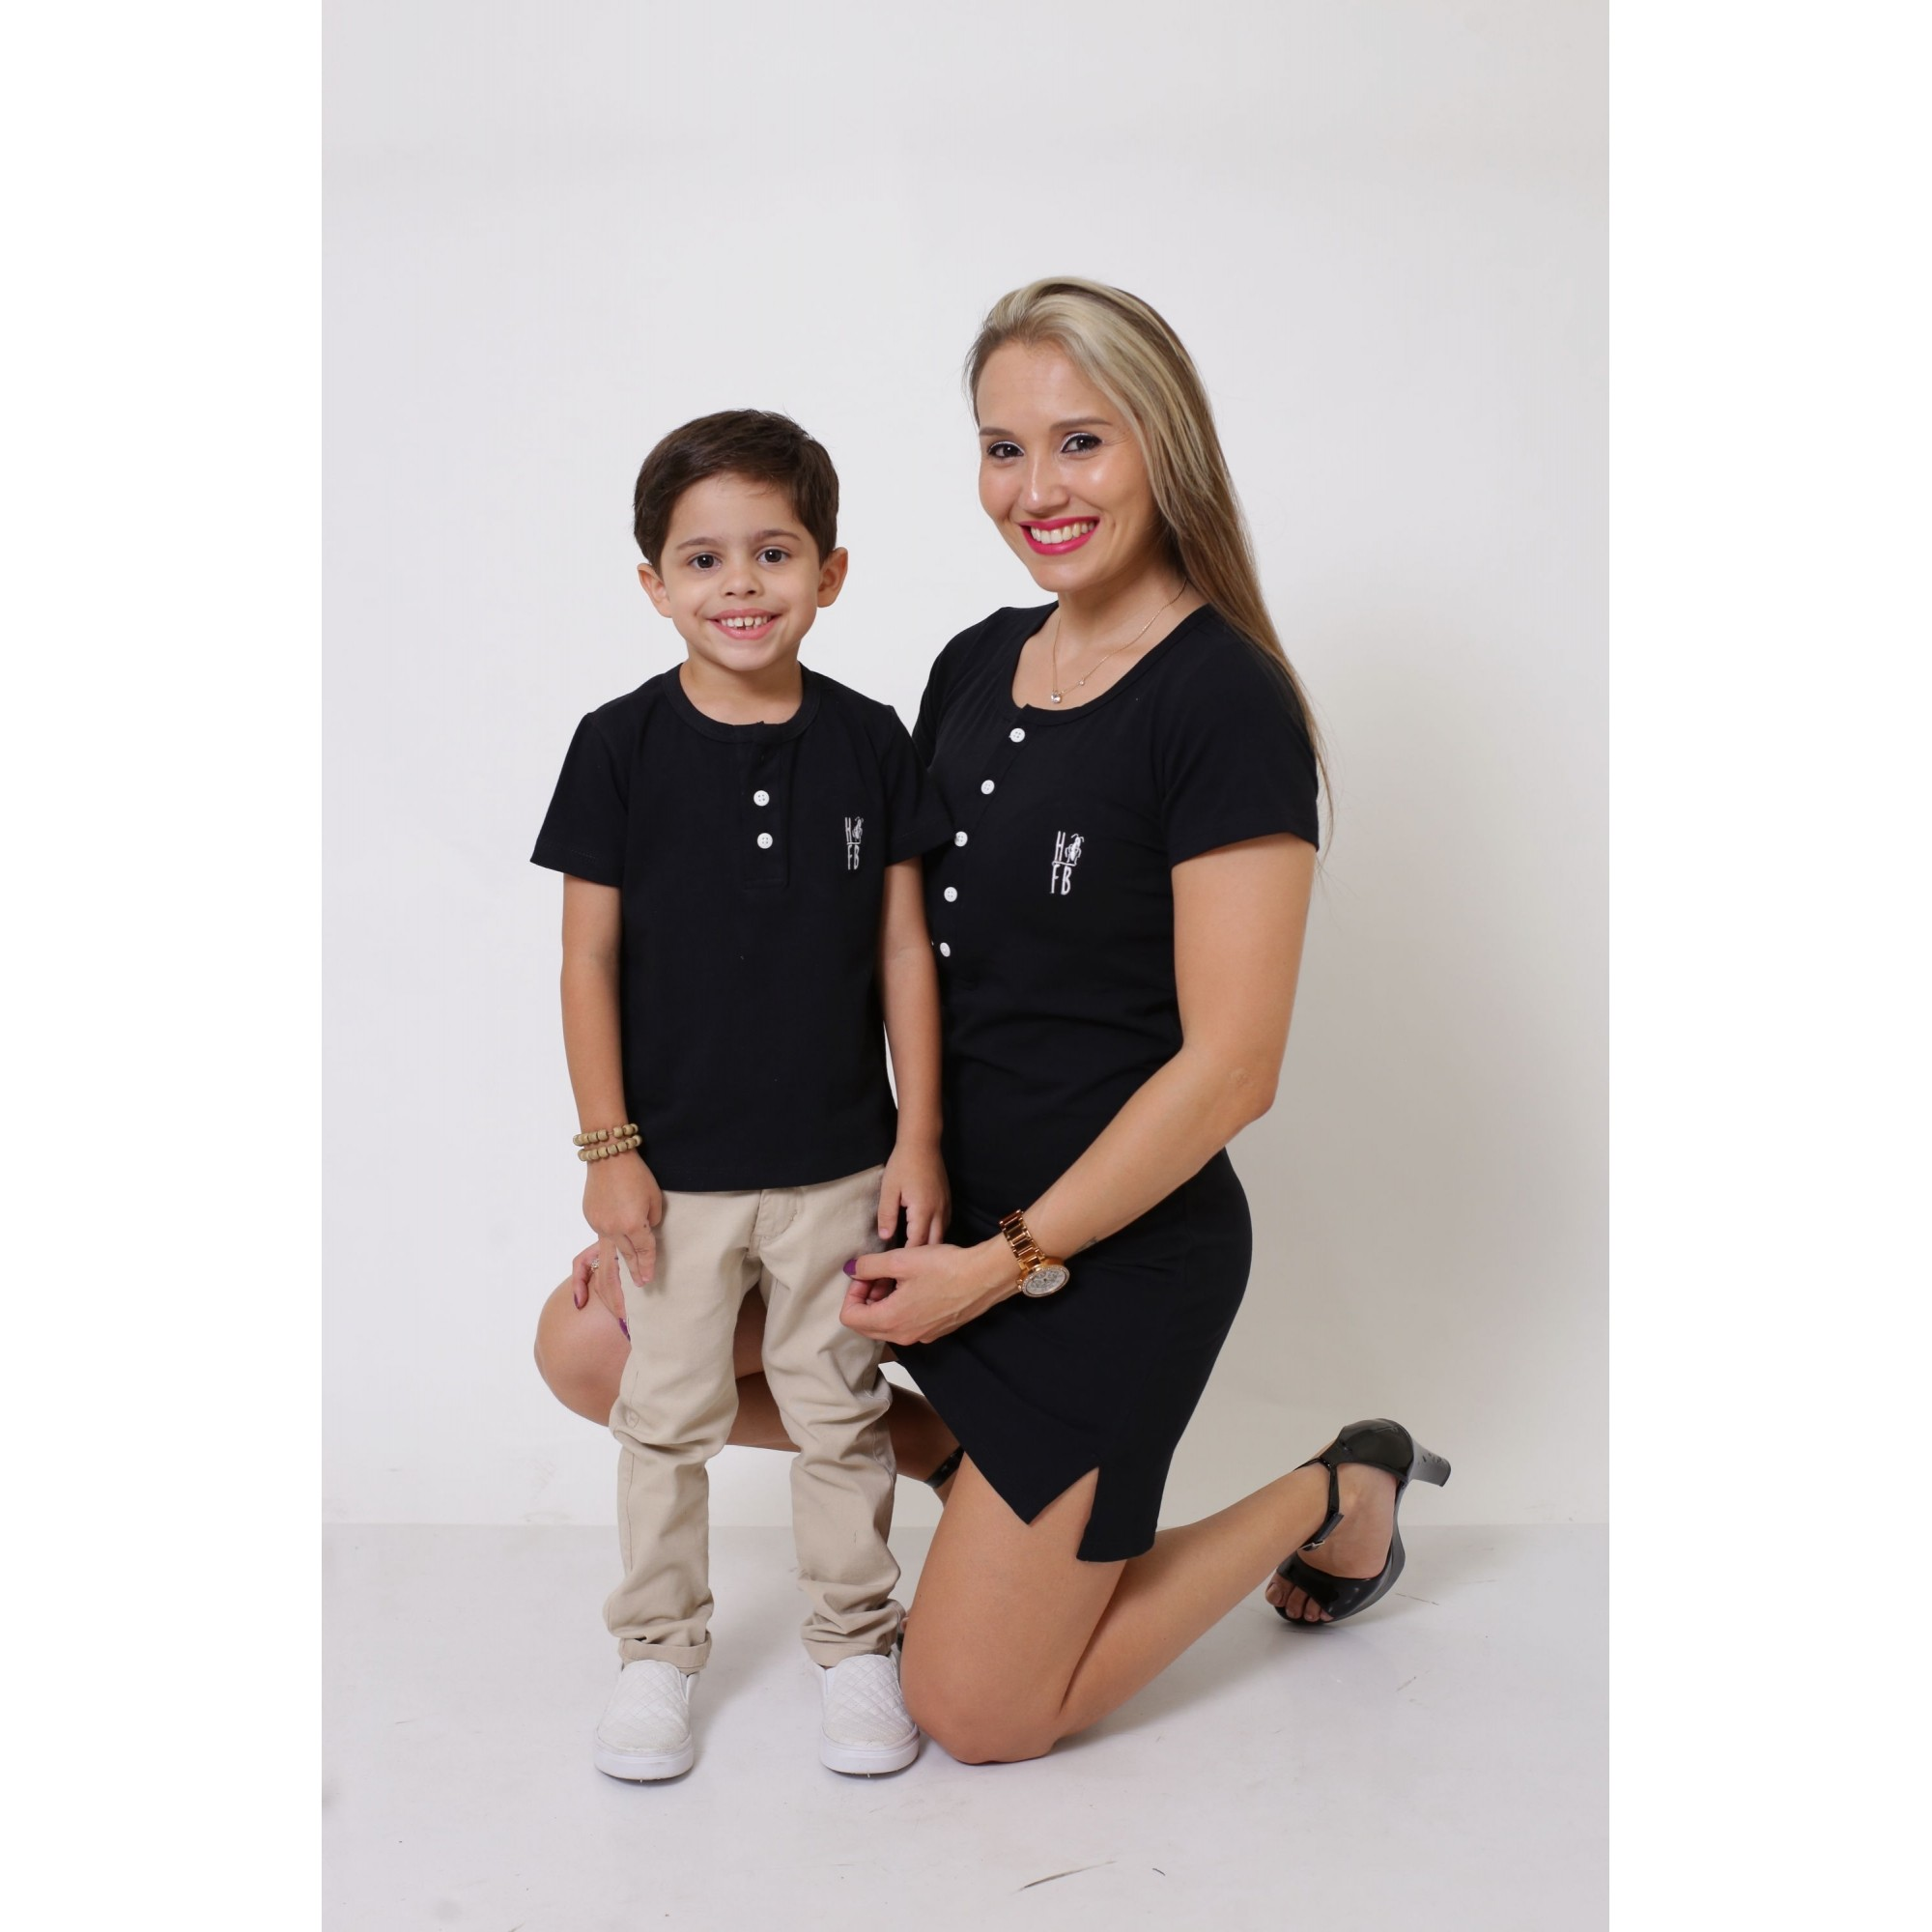 MÃE E FILHO > Kit Vestido + T-shirt Unissex ou Body Infantil - Henley - Preto [Coleção Tal Mãe Tal Filho]  - Heitor Fashion Brazil